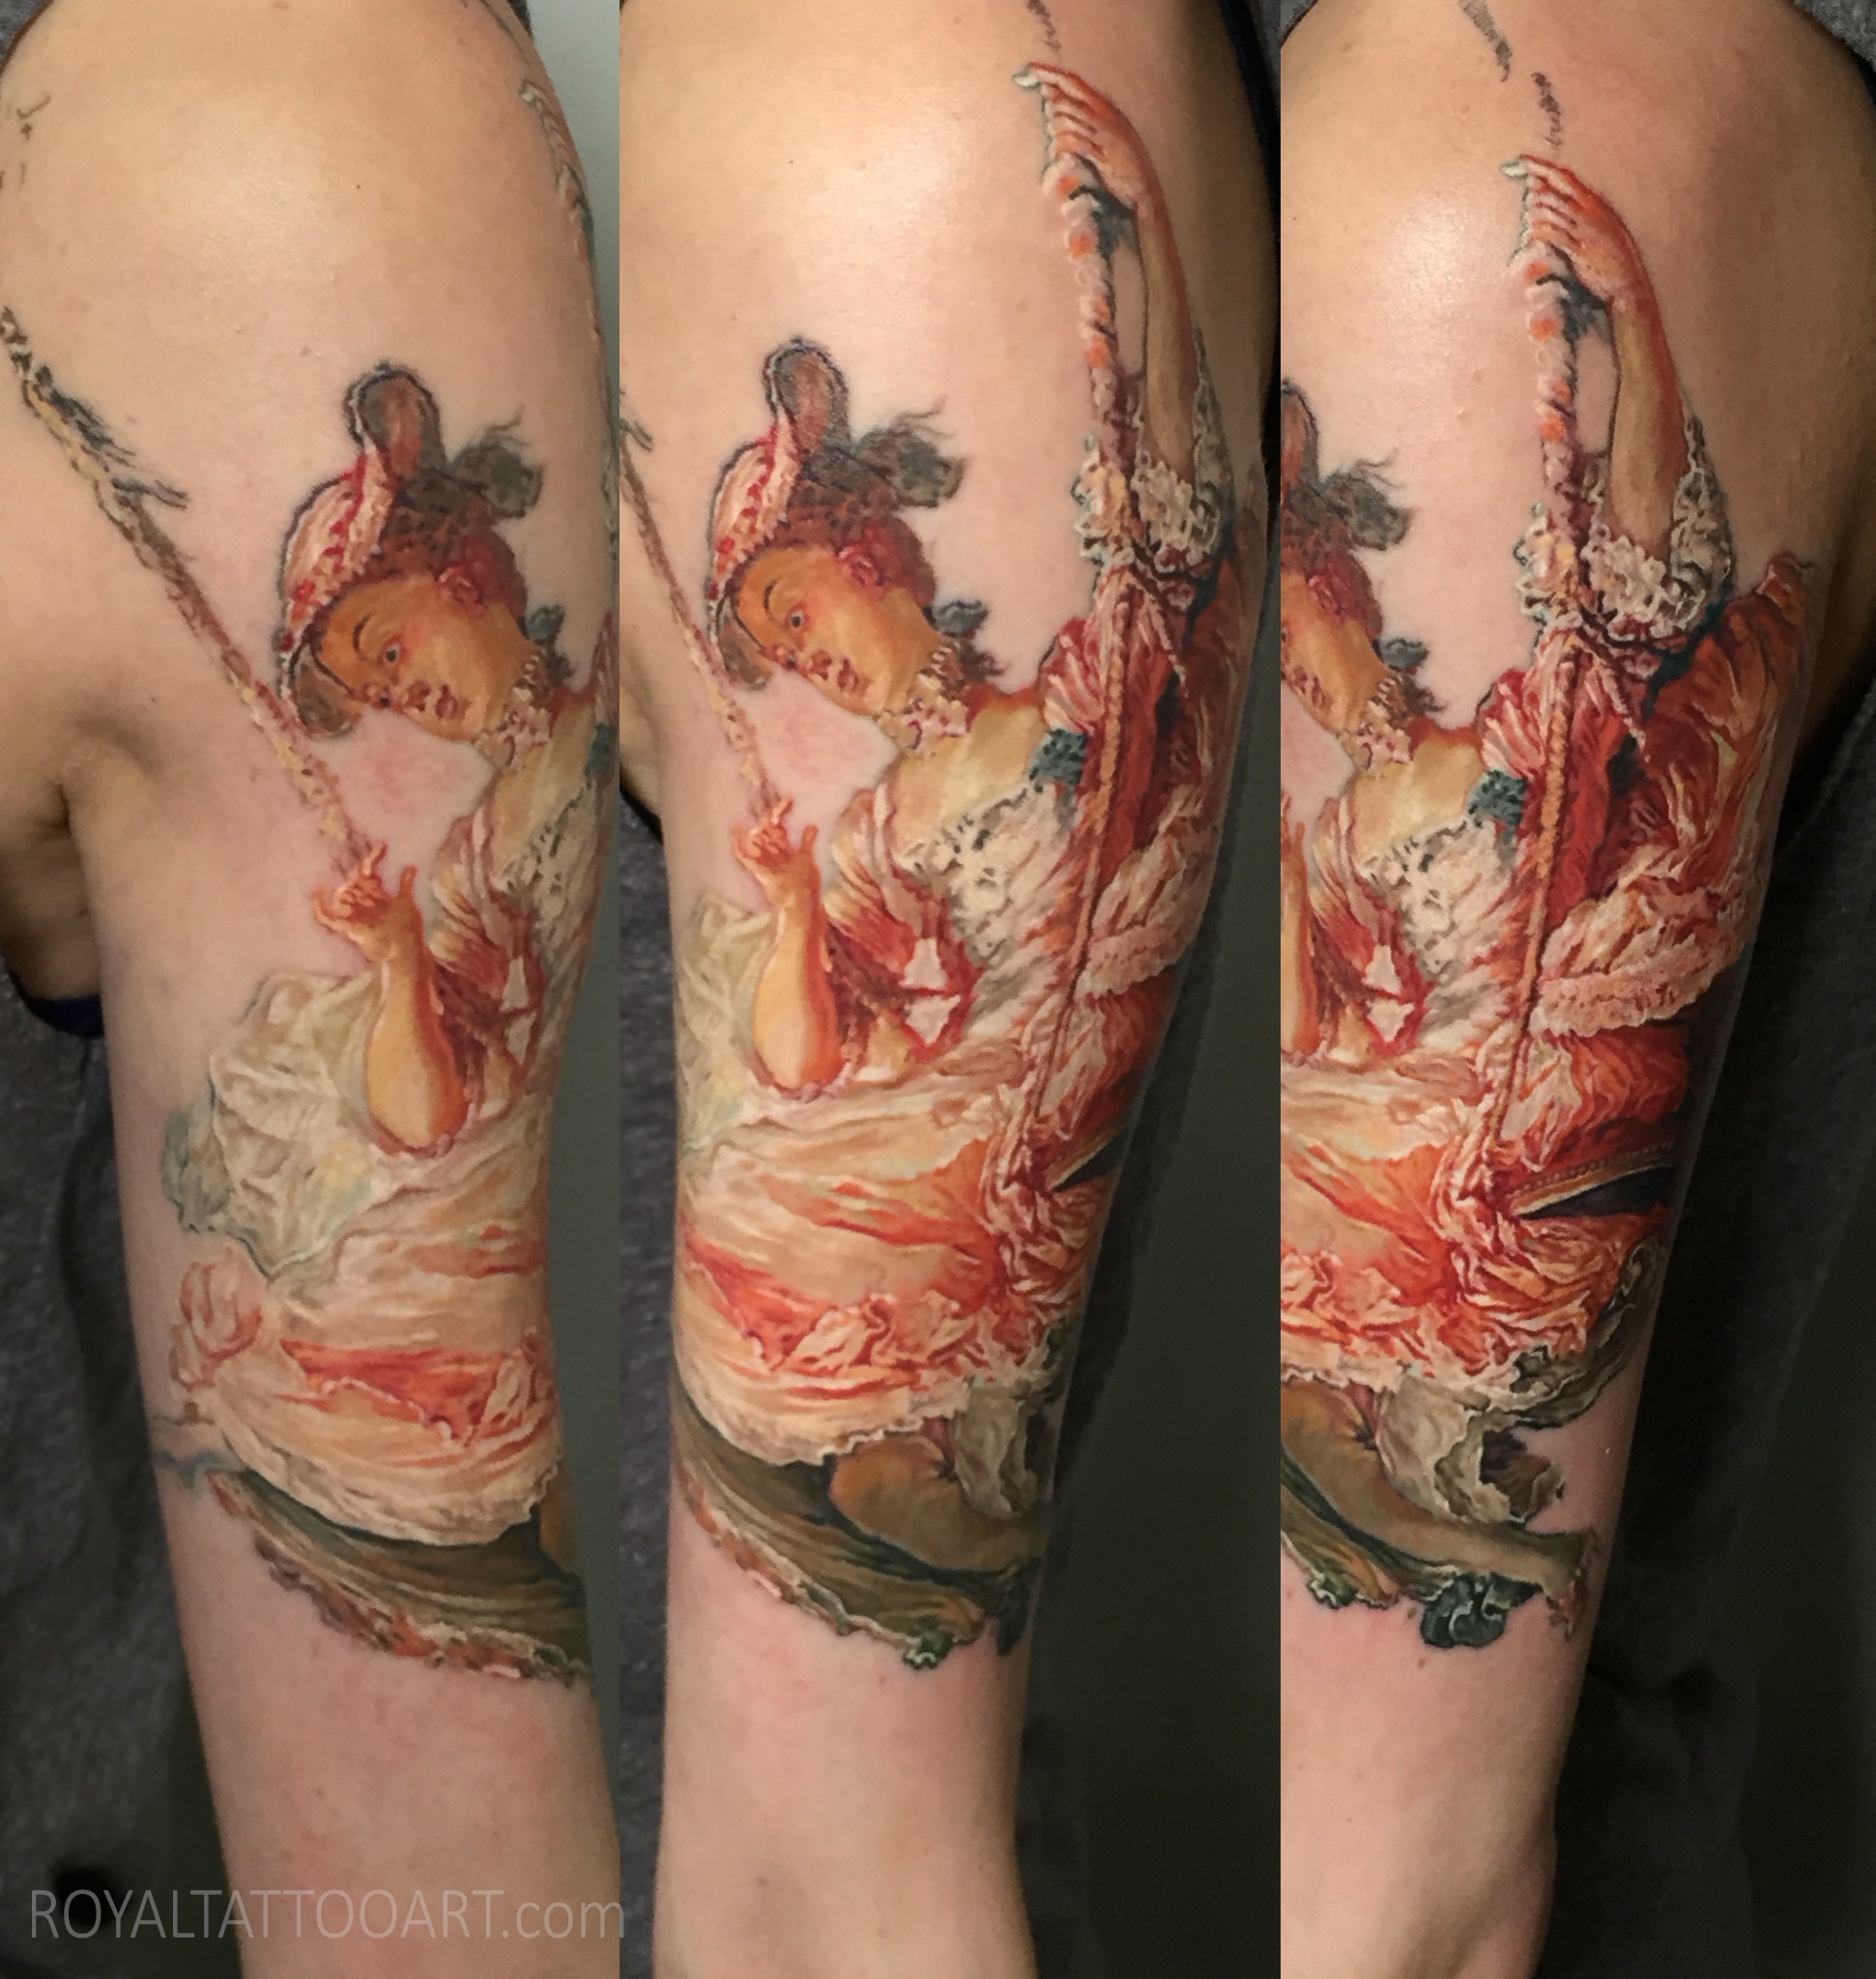 Royal Jafarov painting tattoo realism nyc new york single needle.jpg